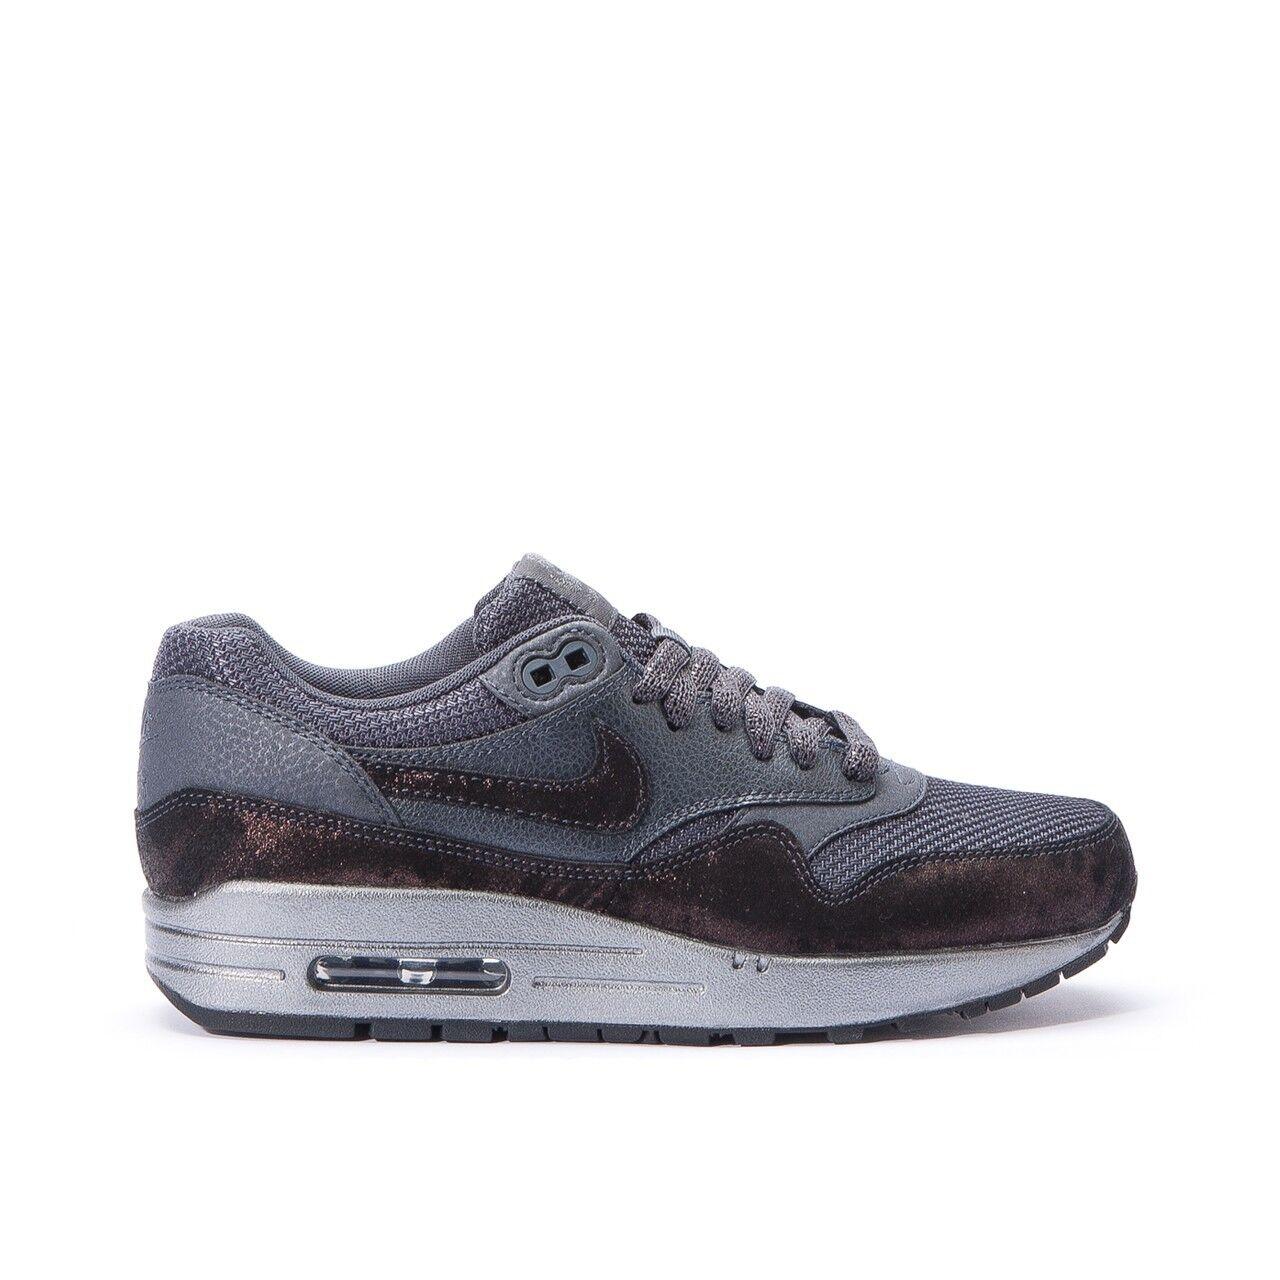 WMNS Nike Air Max 1 PRM SZ 8.5 Anthracite Metallic Hematite Noir 454746-007